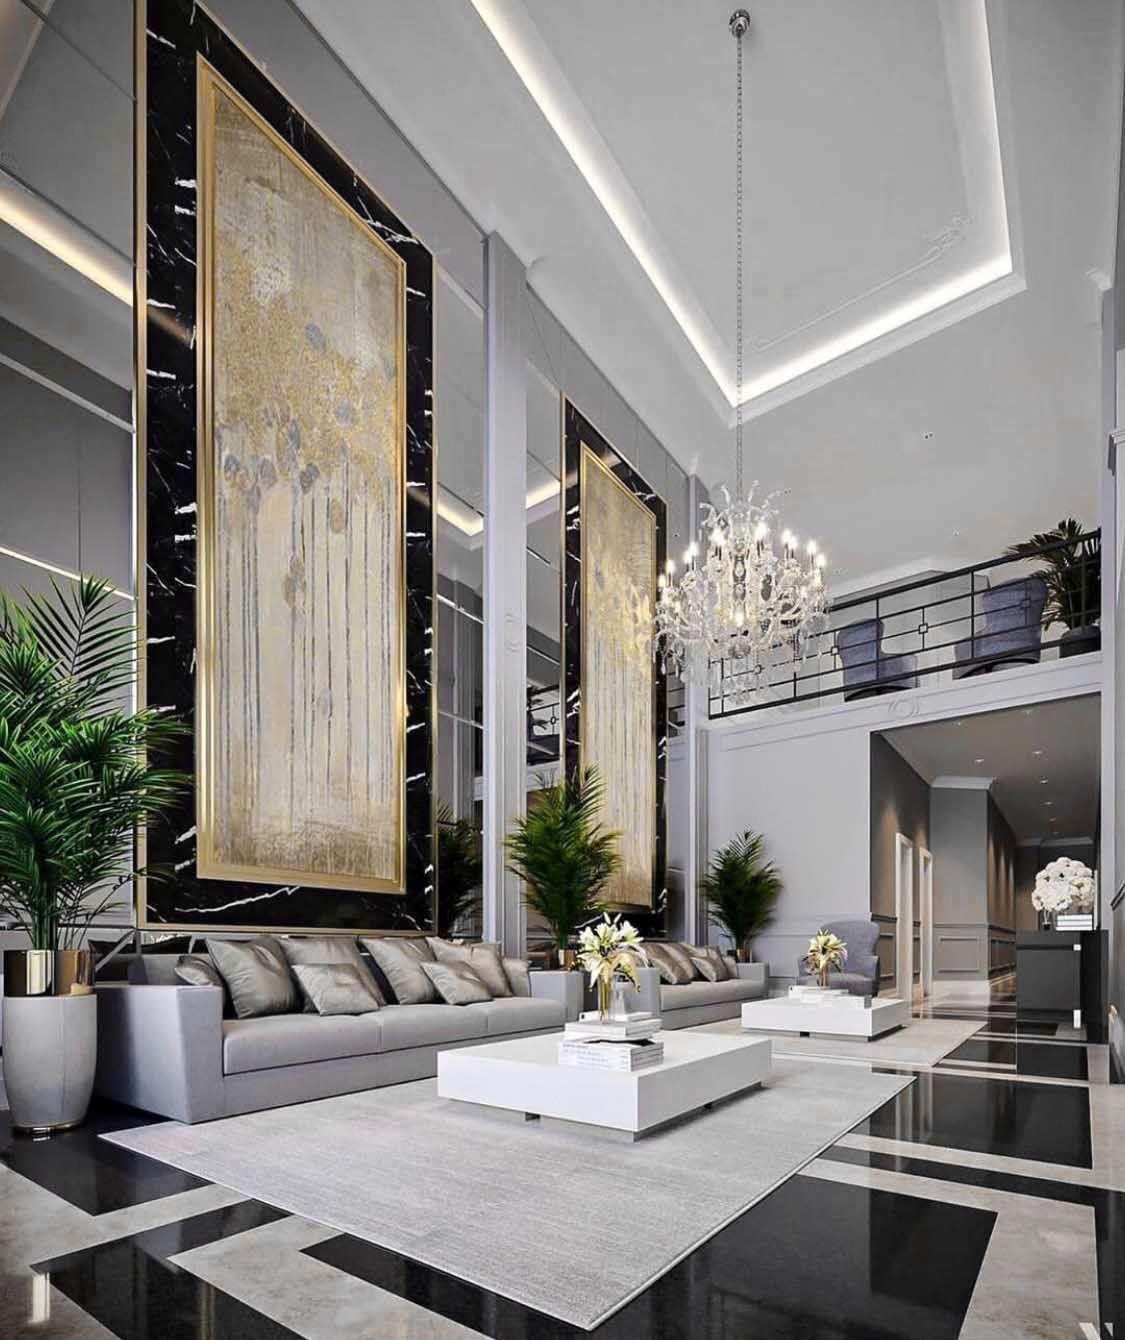 Majestic Luxury modern style living room decor with luxury sofa